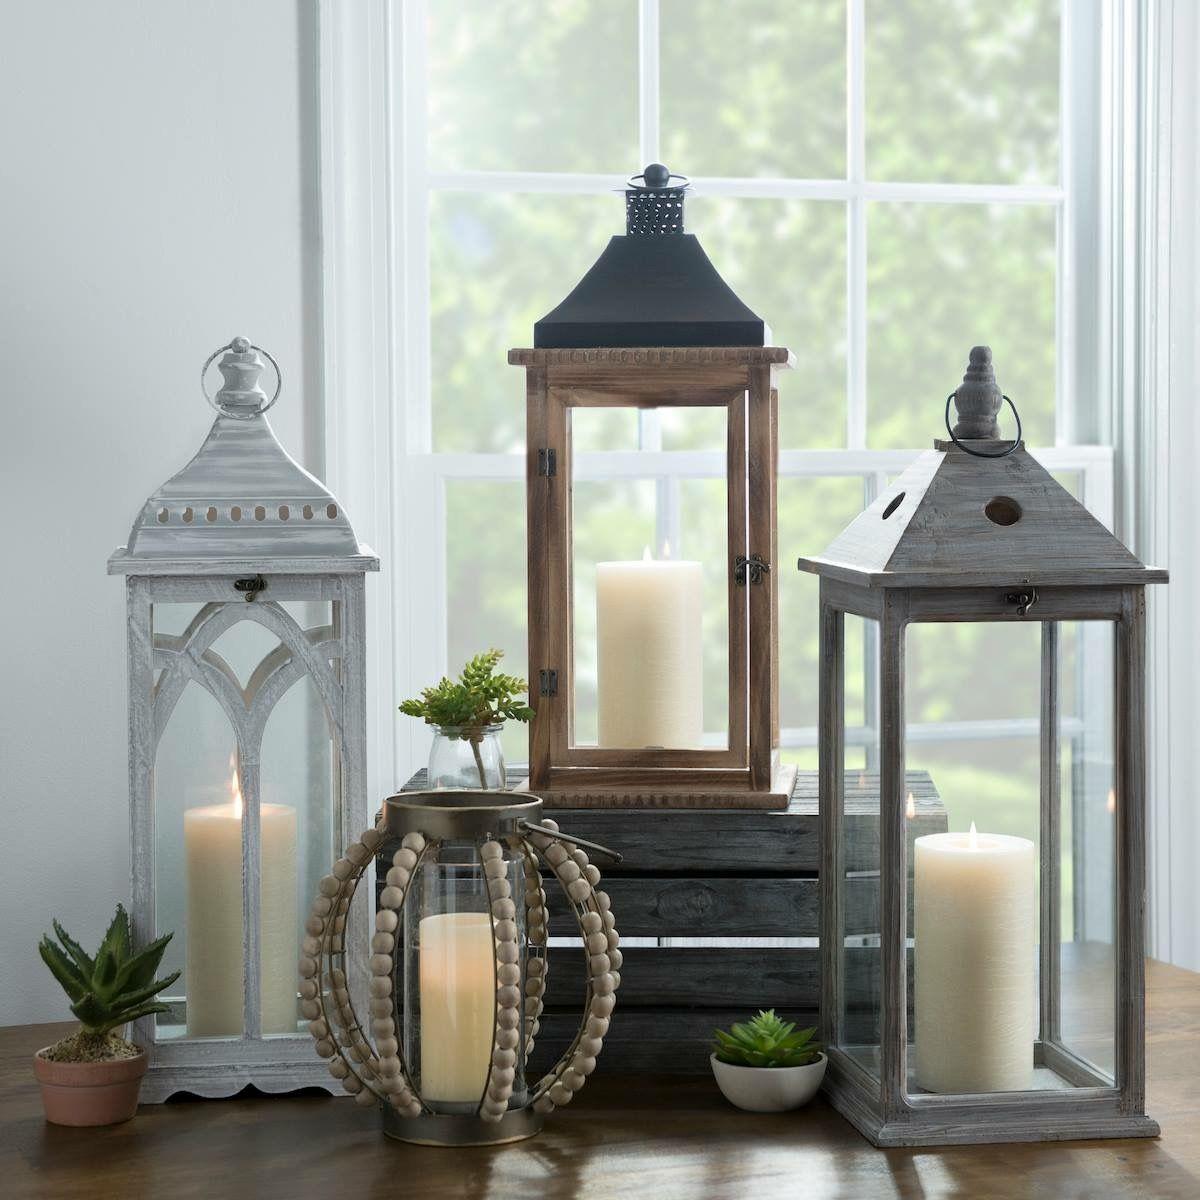 Kirklands Lanterns (With images) | Artisan decor, Antique ... on Lanterns At Kirklands id=69275